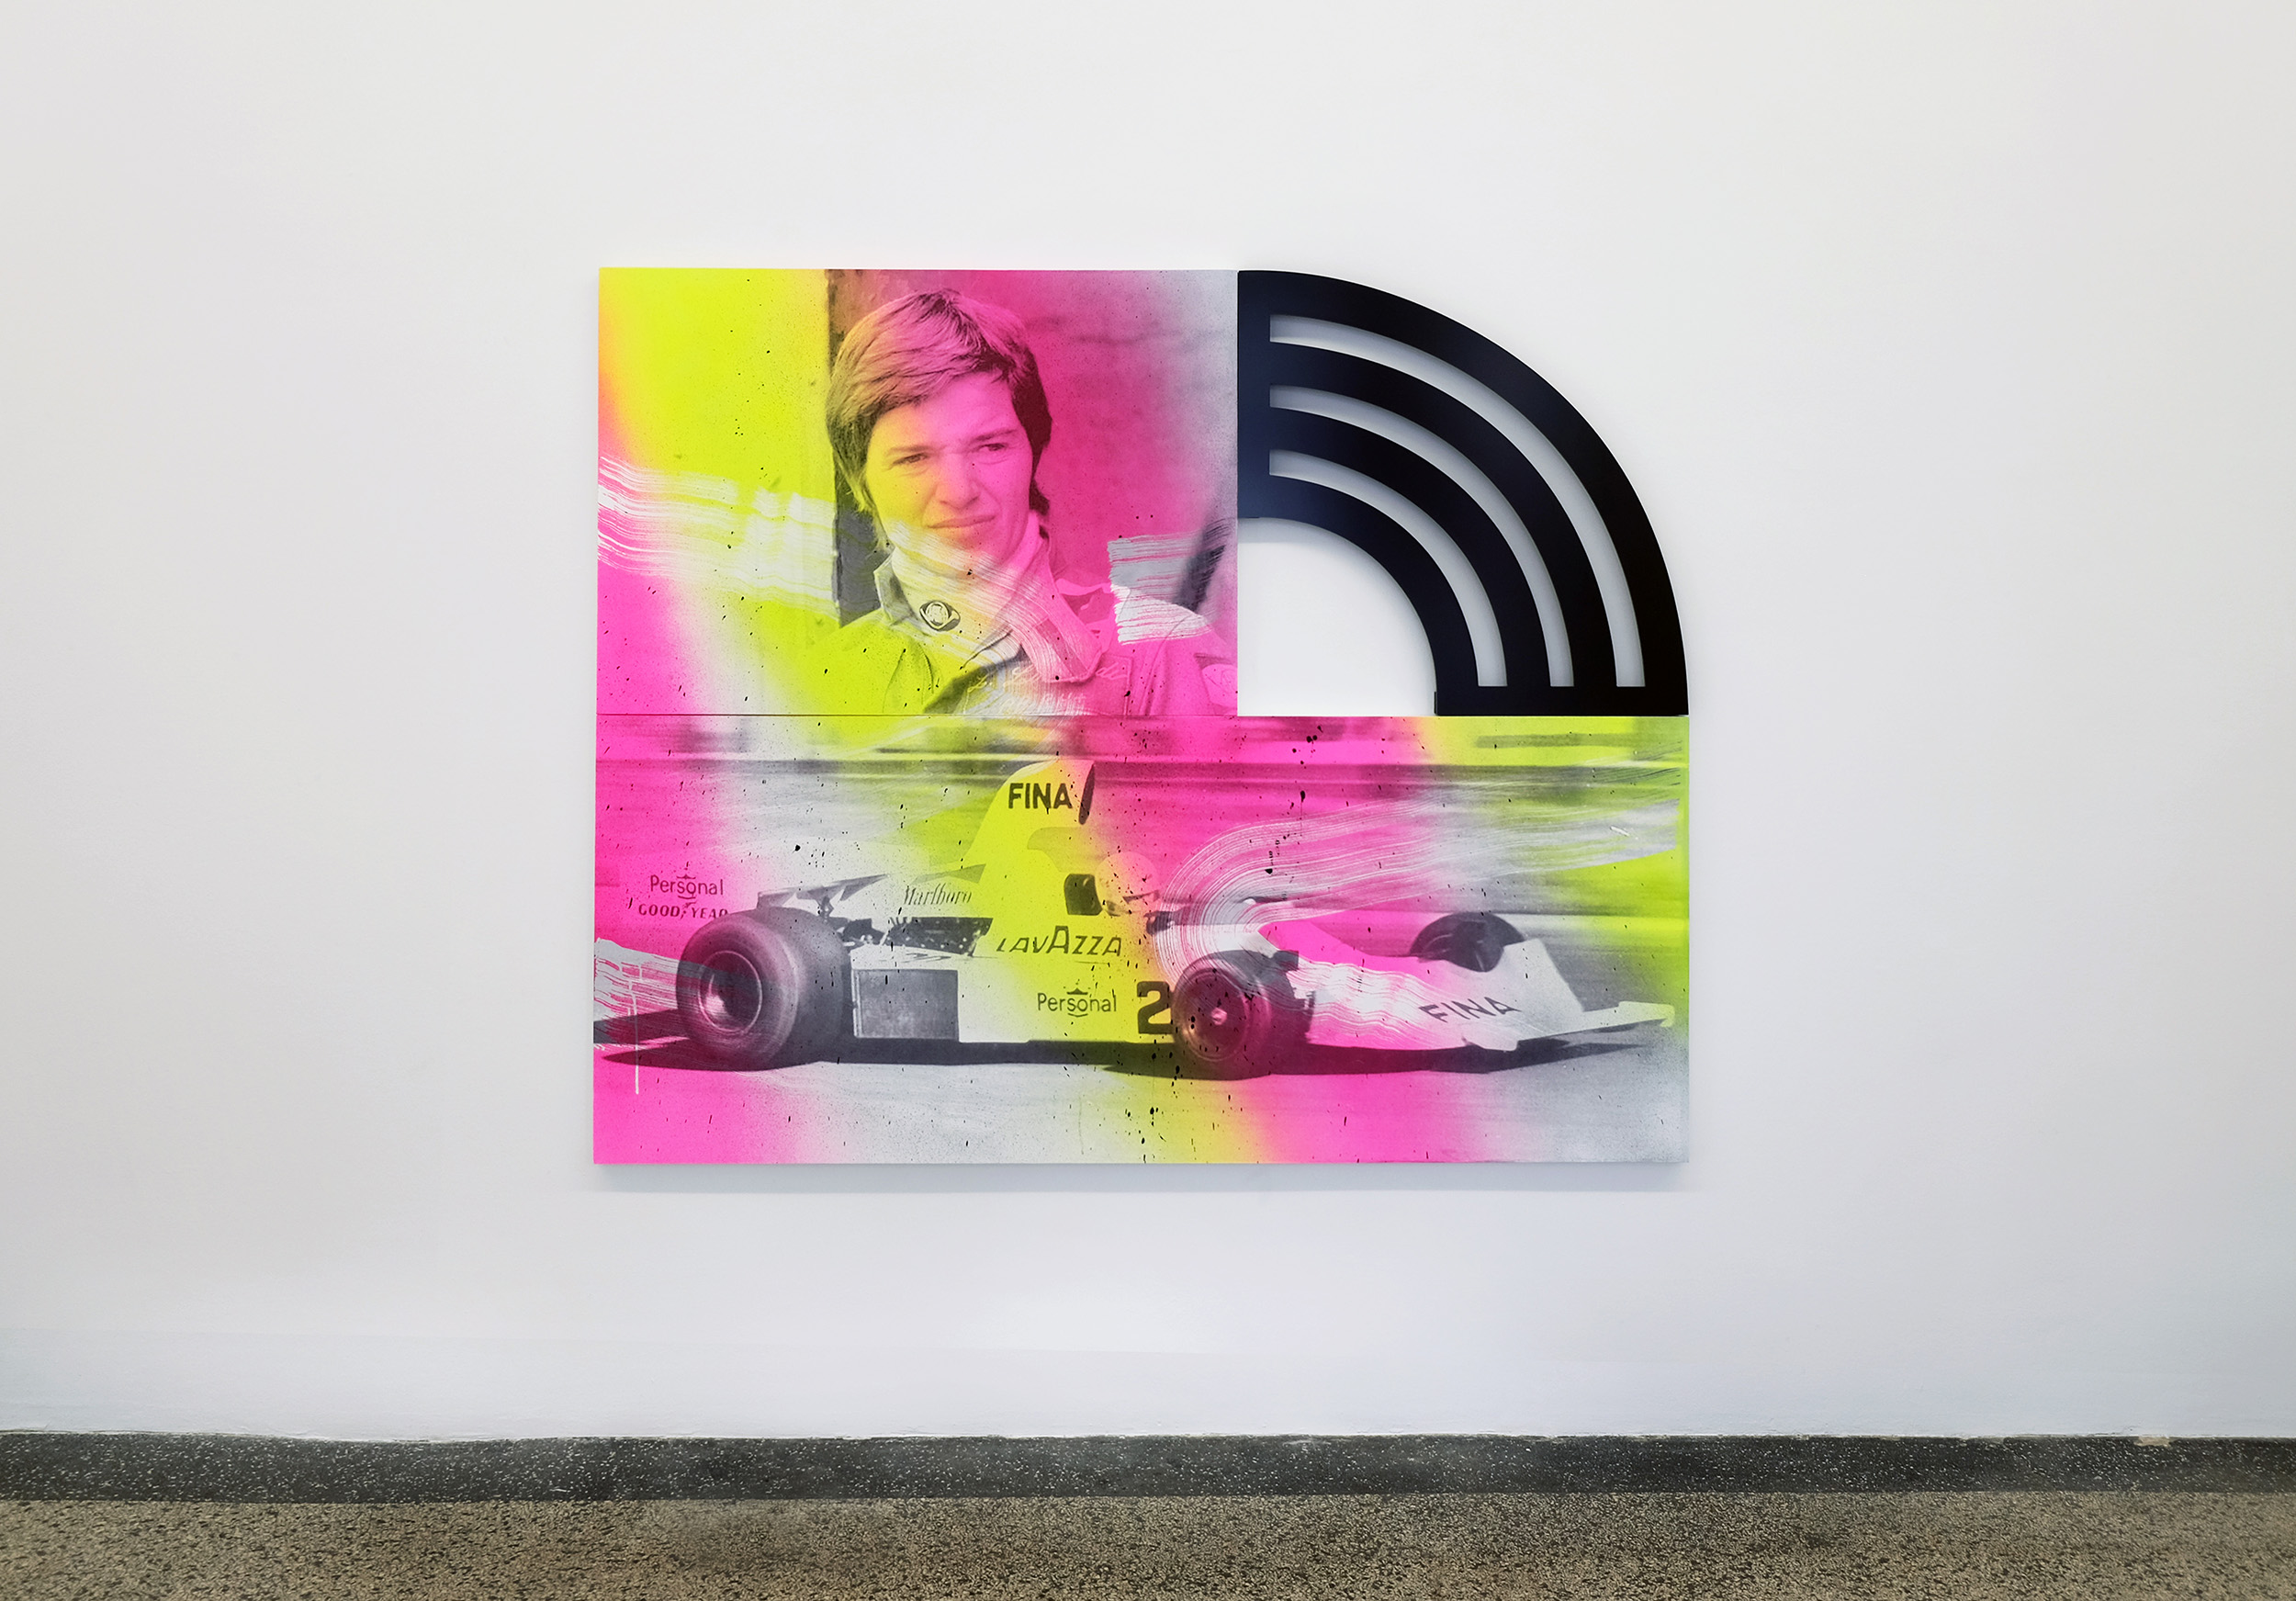 4 - Wendy White at Van Horn Dusseldorf